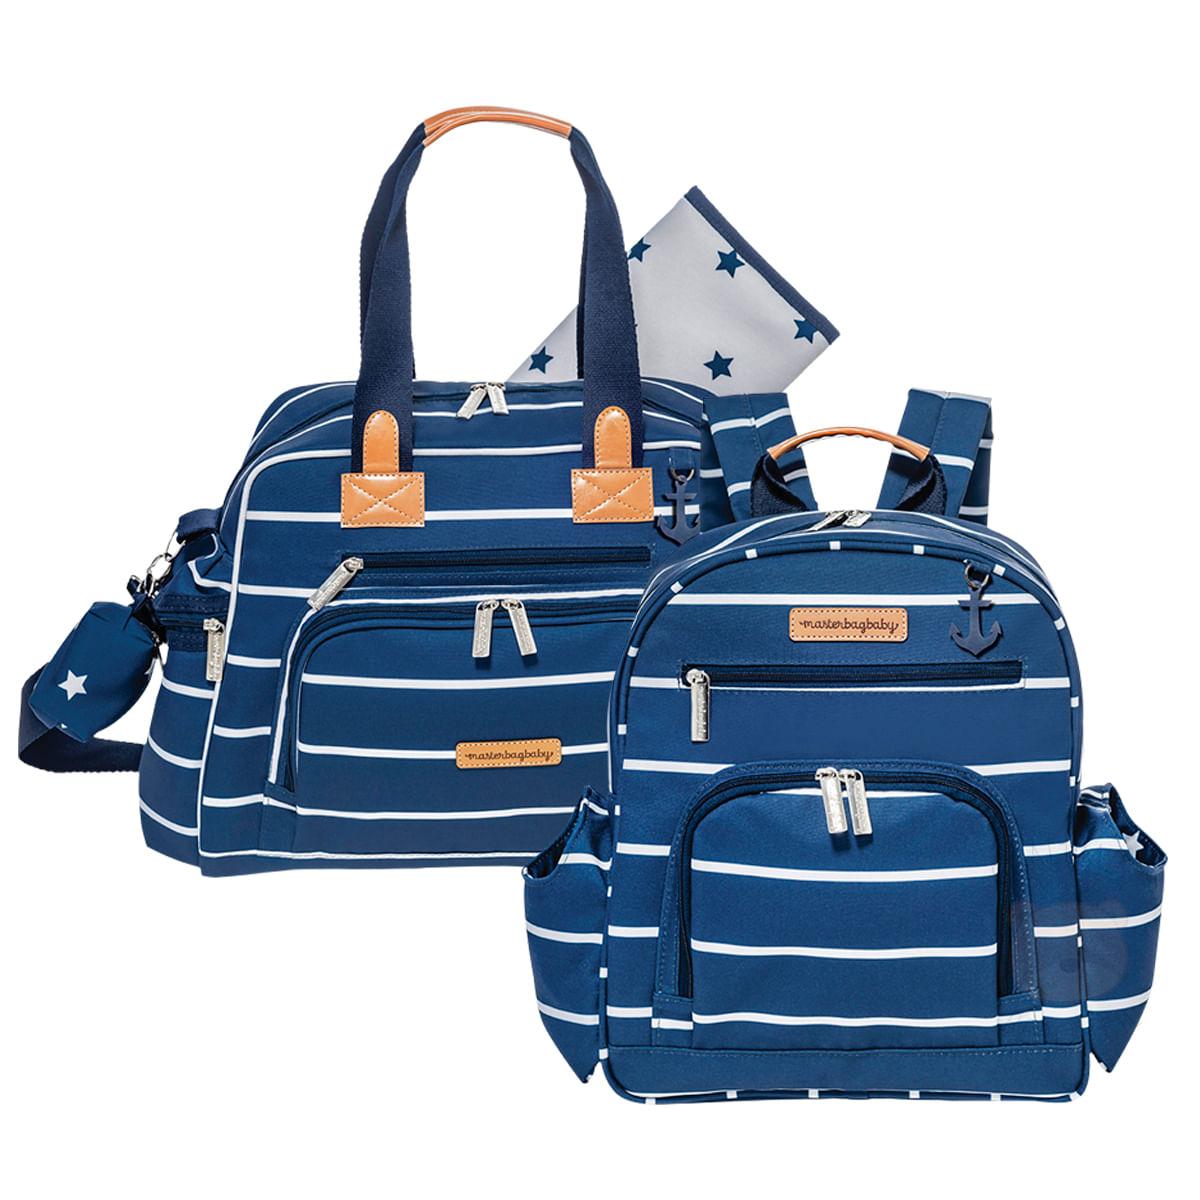 ea5b9b5b9e Bolsa Everyday + Mochila Maternidade Noah Navy Star Marinho - Masterbag -  bebefacil